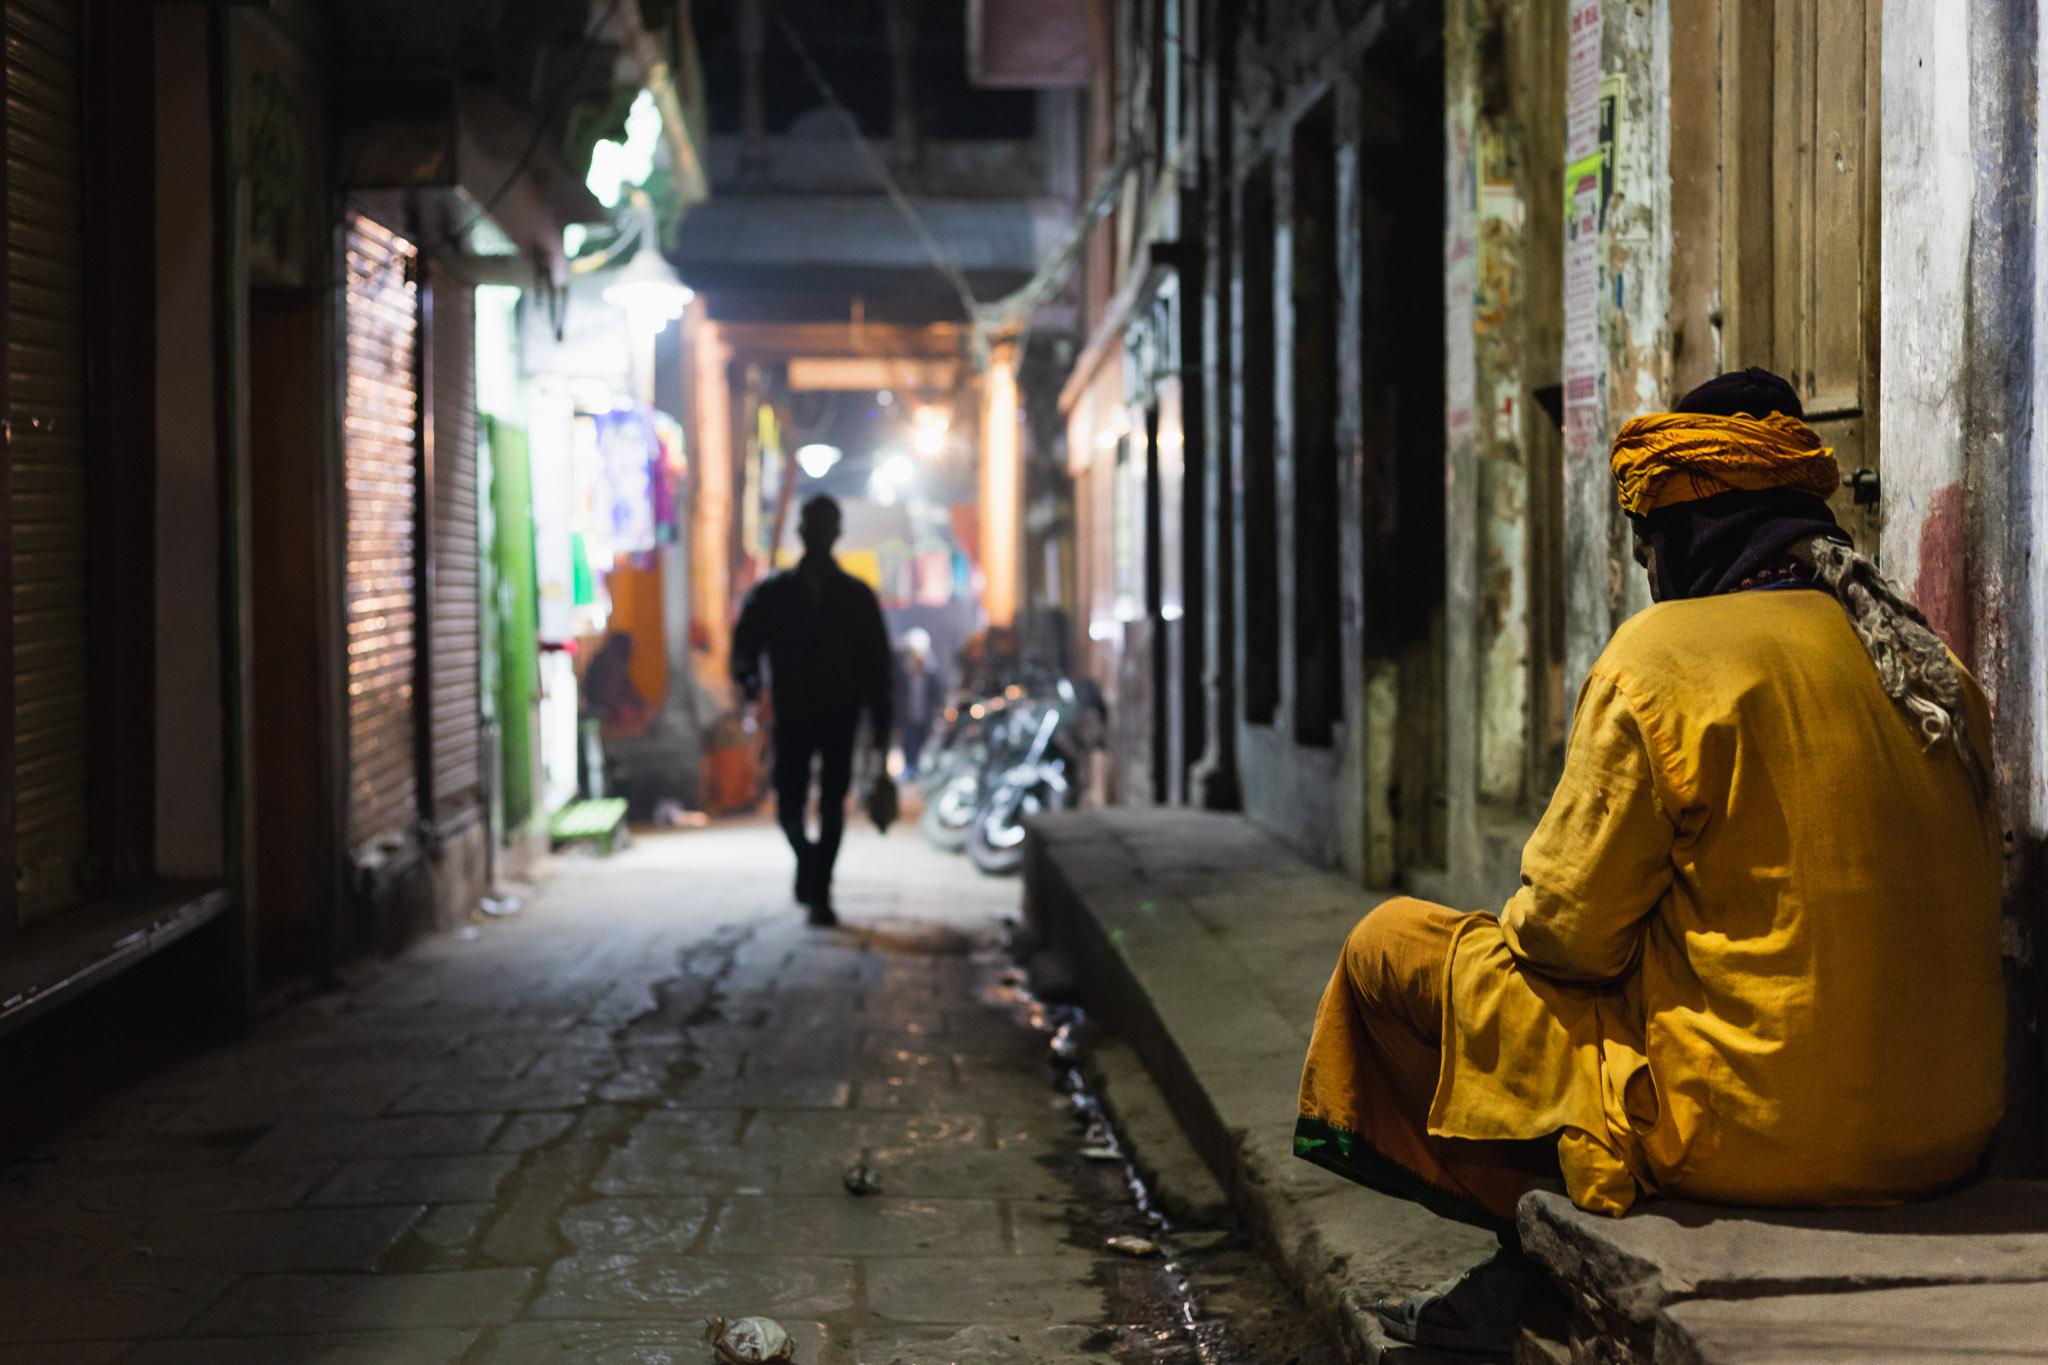 Dark alleyways of Varanasi, India.